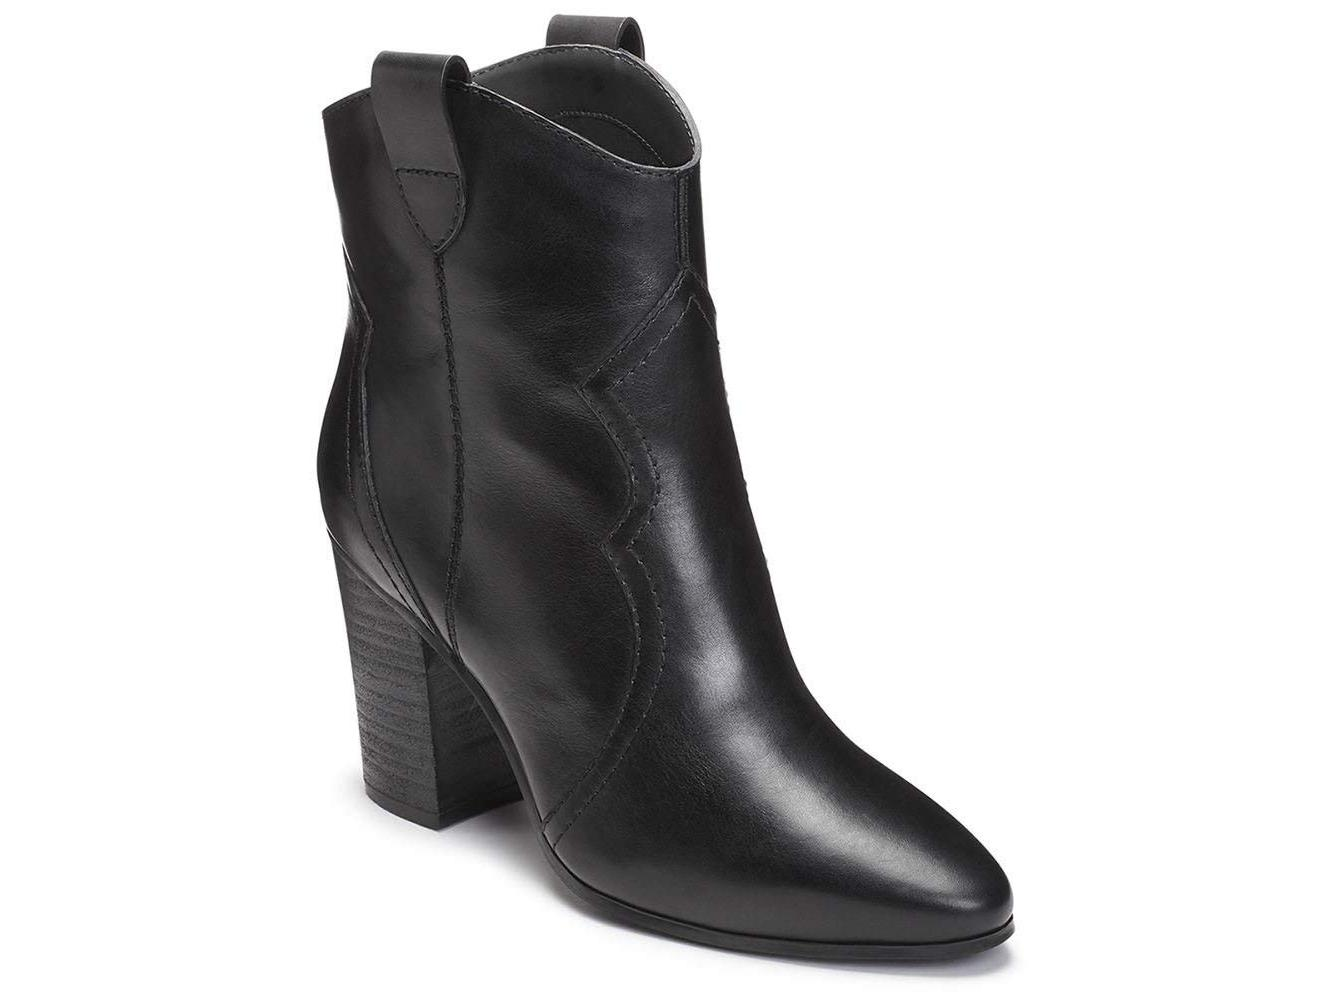 794831de9155 Aerosoles Womens Lincoln Square Pointed Toe Ankle Fashion